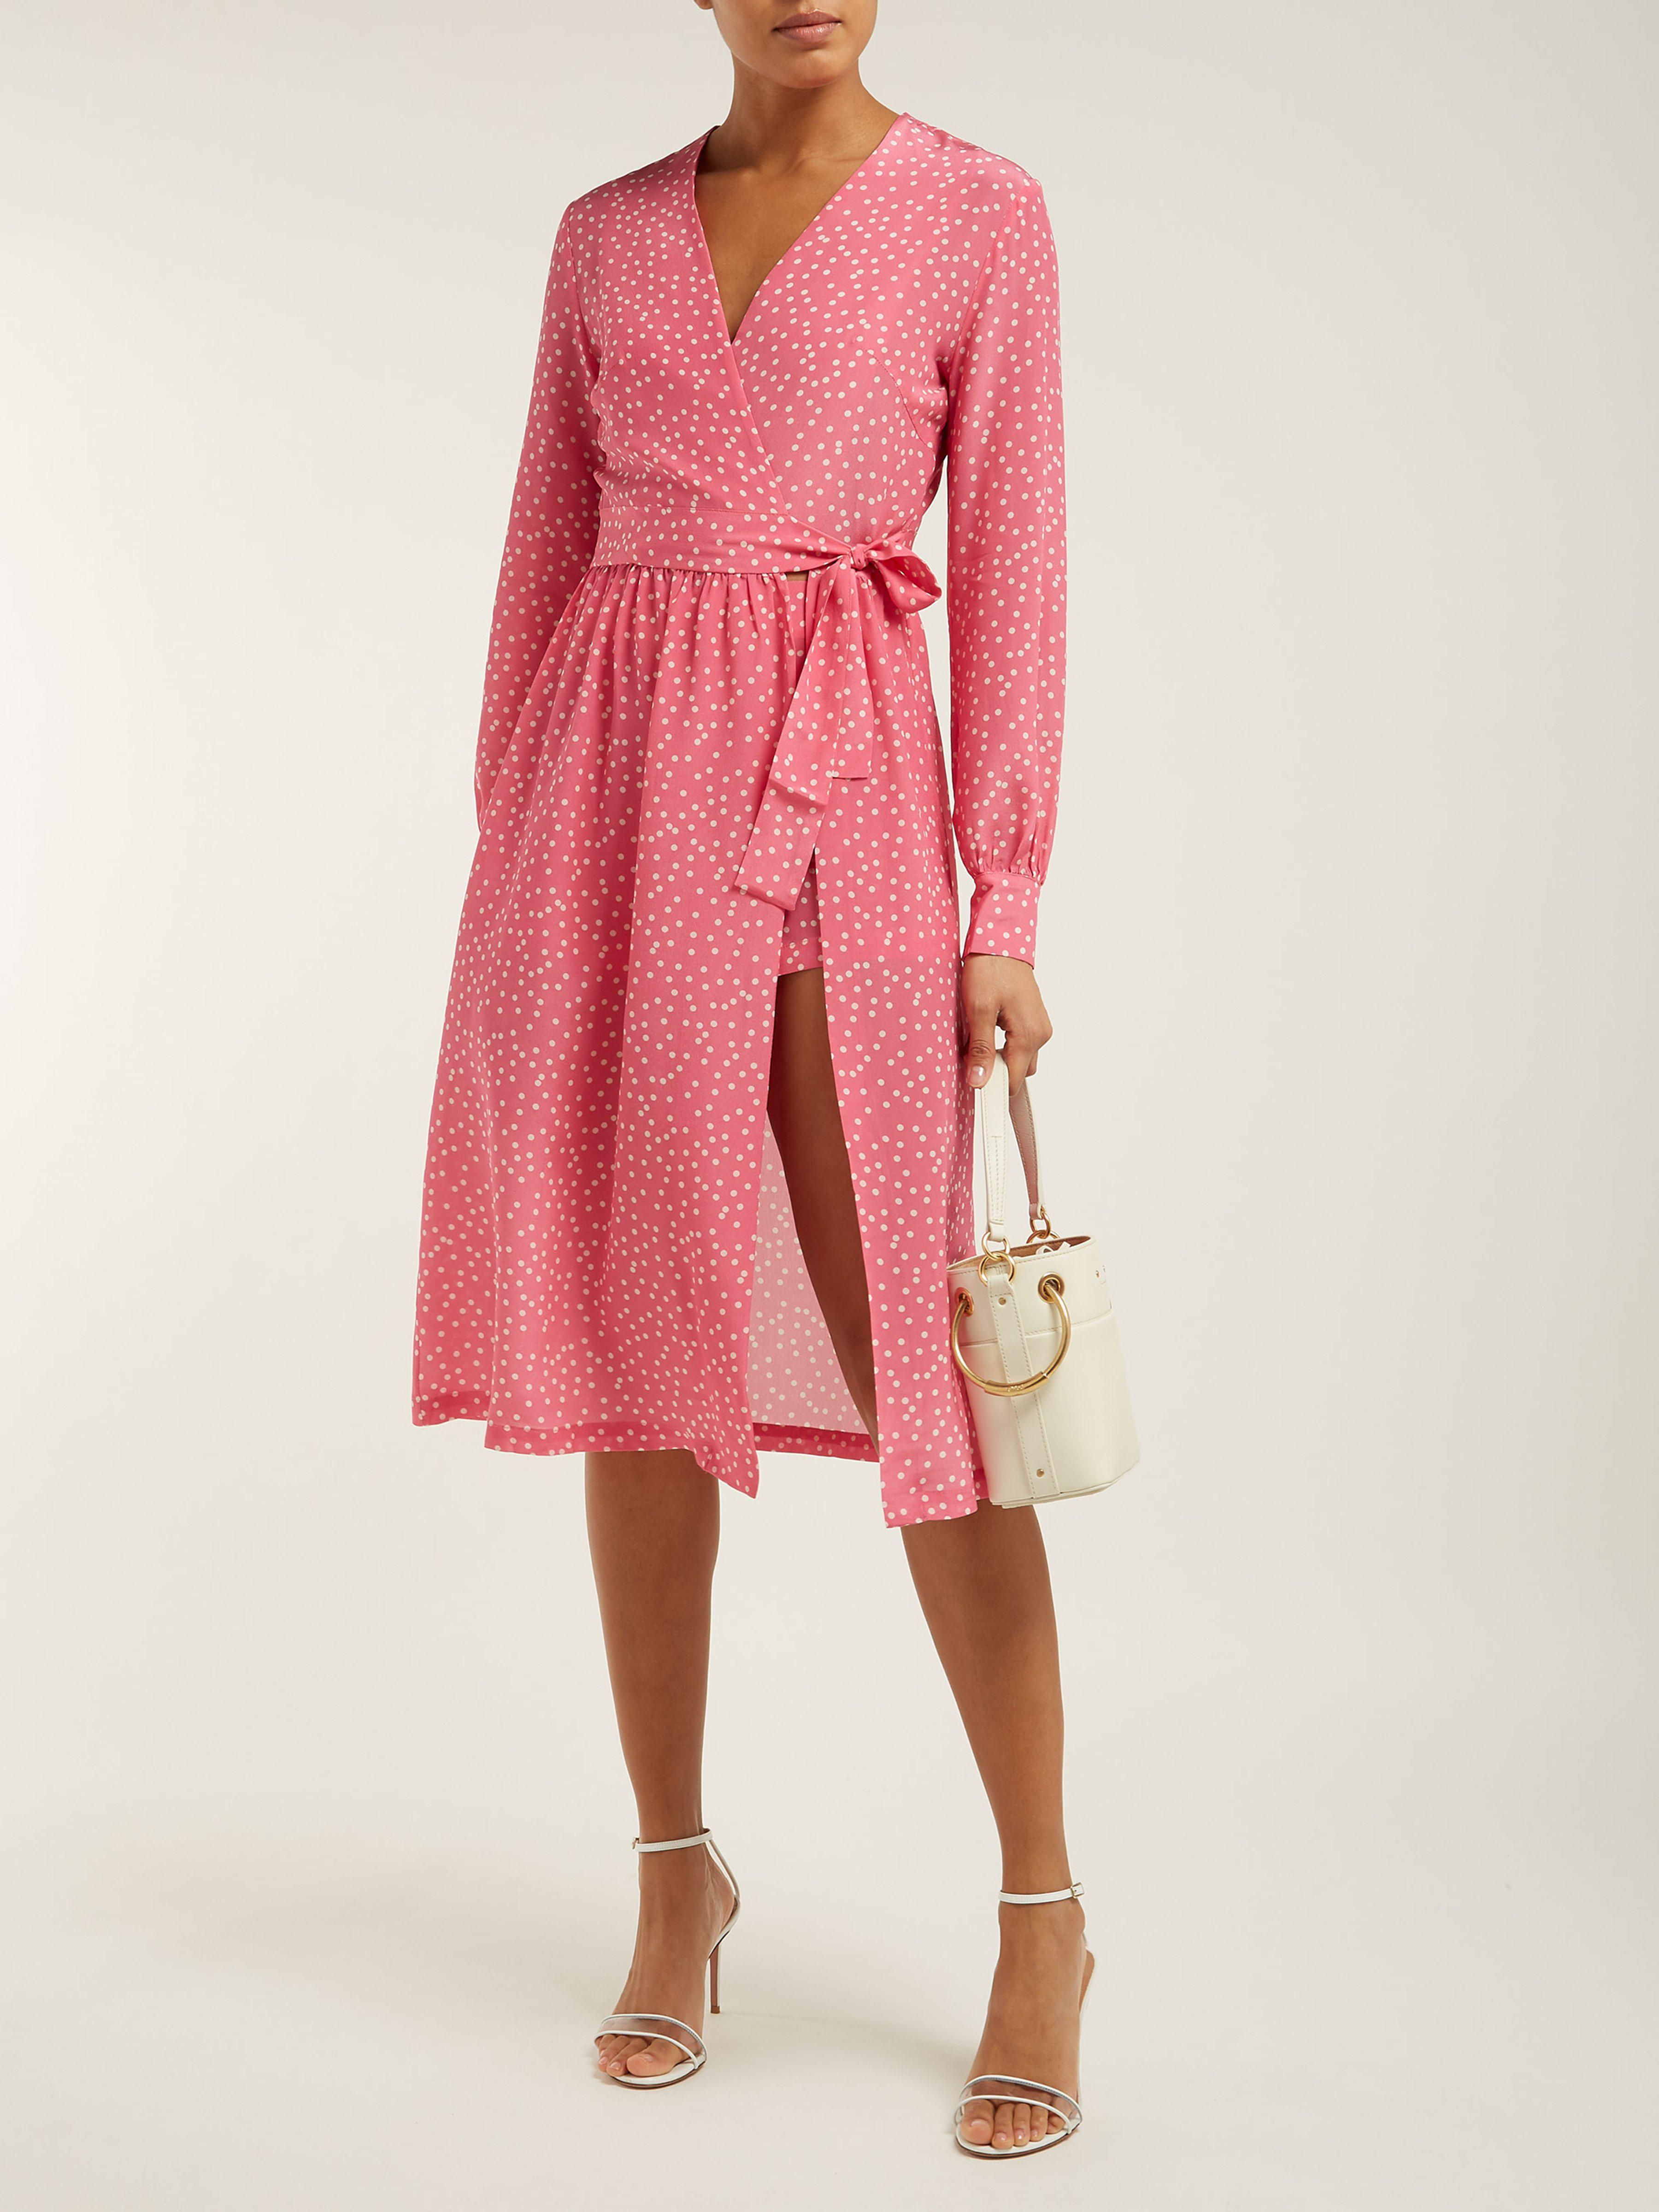 f6bb02c91123 Adriana Degreas Mille Punti Polka Dot Print Silk Crepe Wrap Dress in Pink -  Lyst